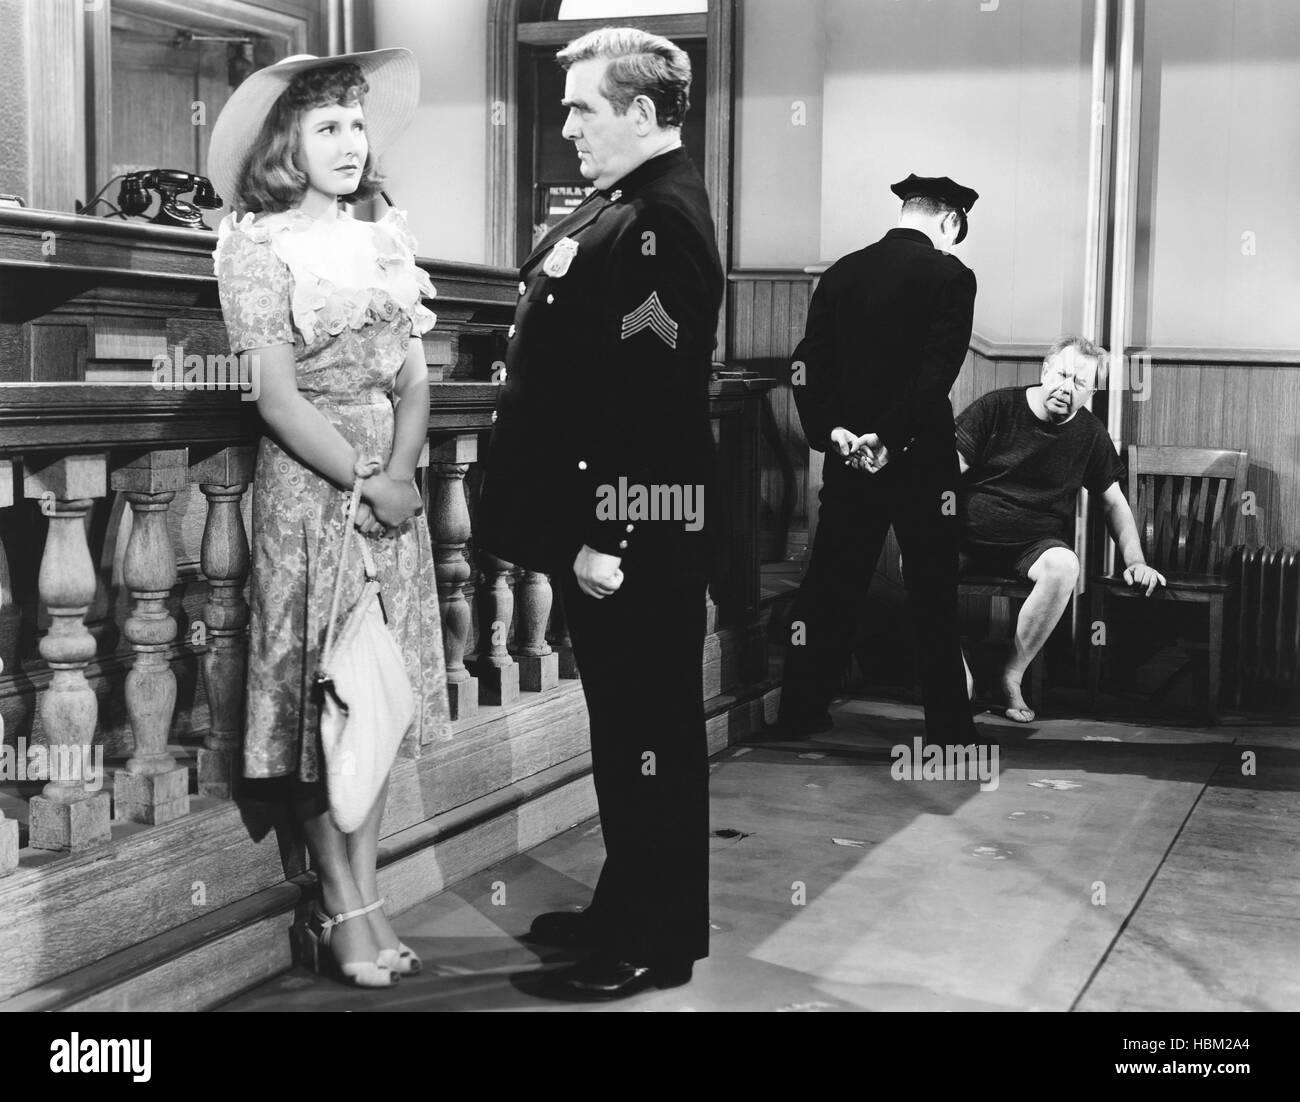 The Devil And Miss Jones From Left Jean Arthur Edward Mcnamara Regis Toomey Charles Coburn 1941